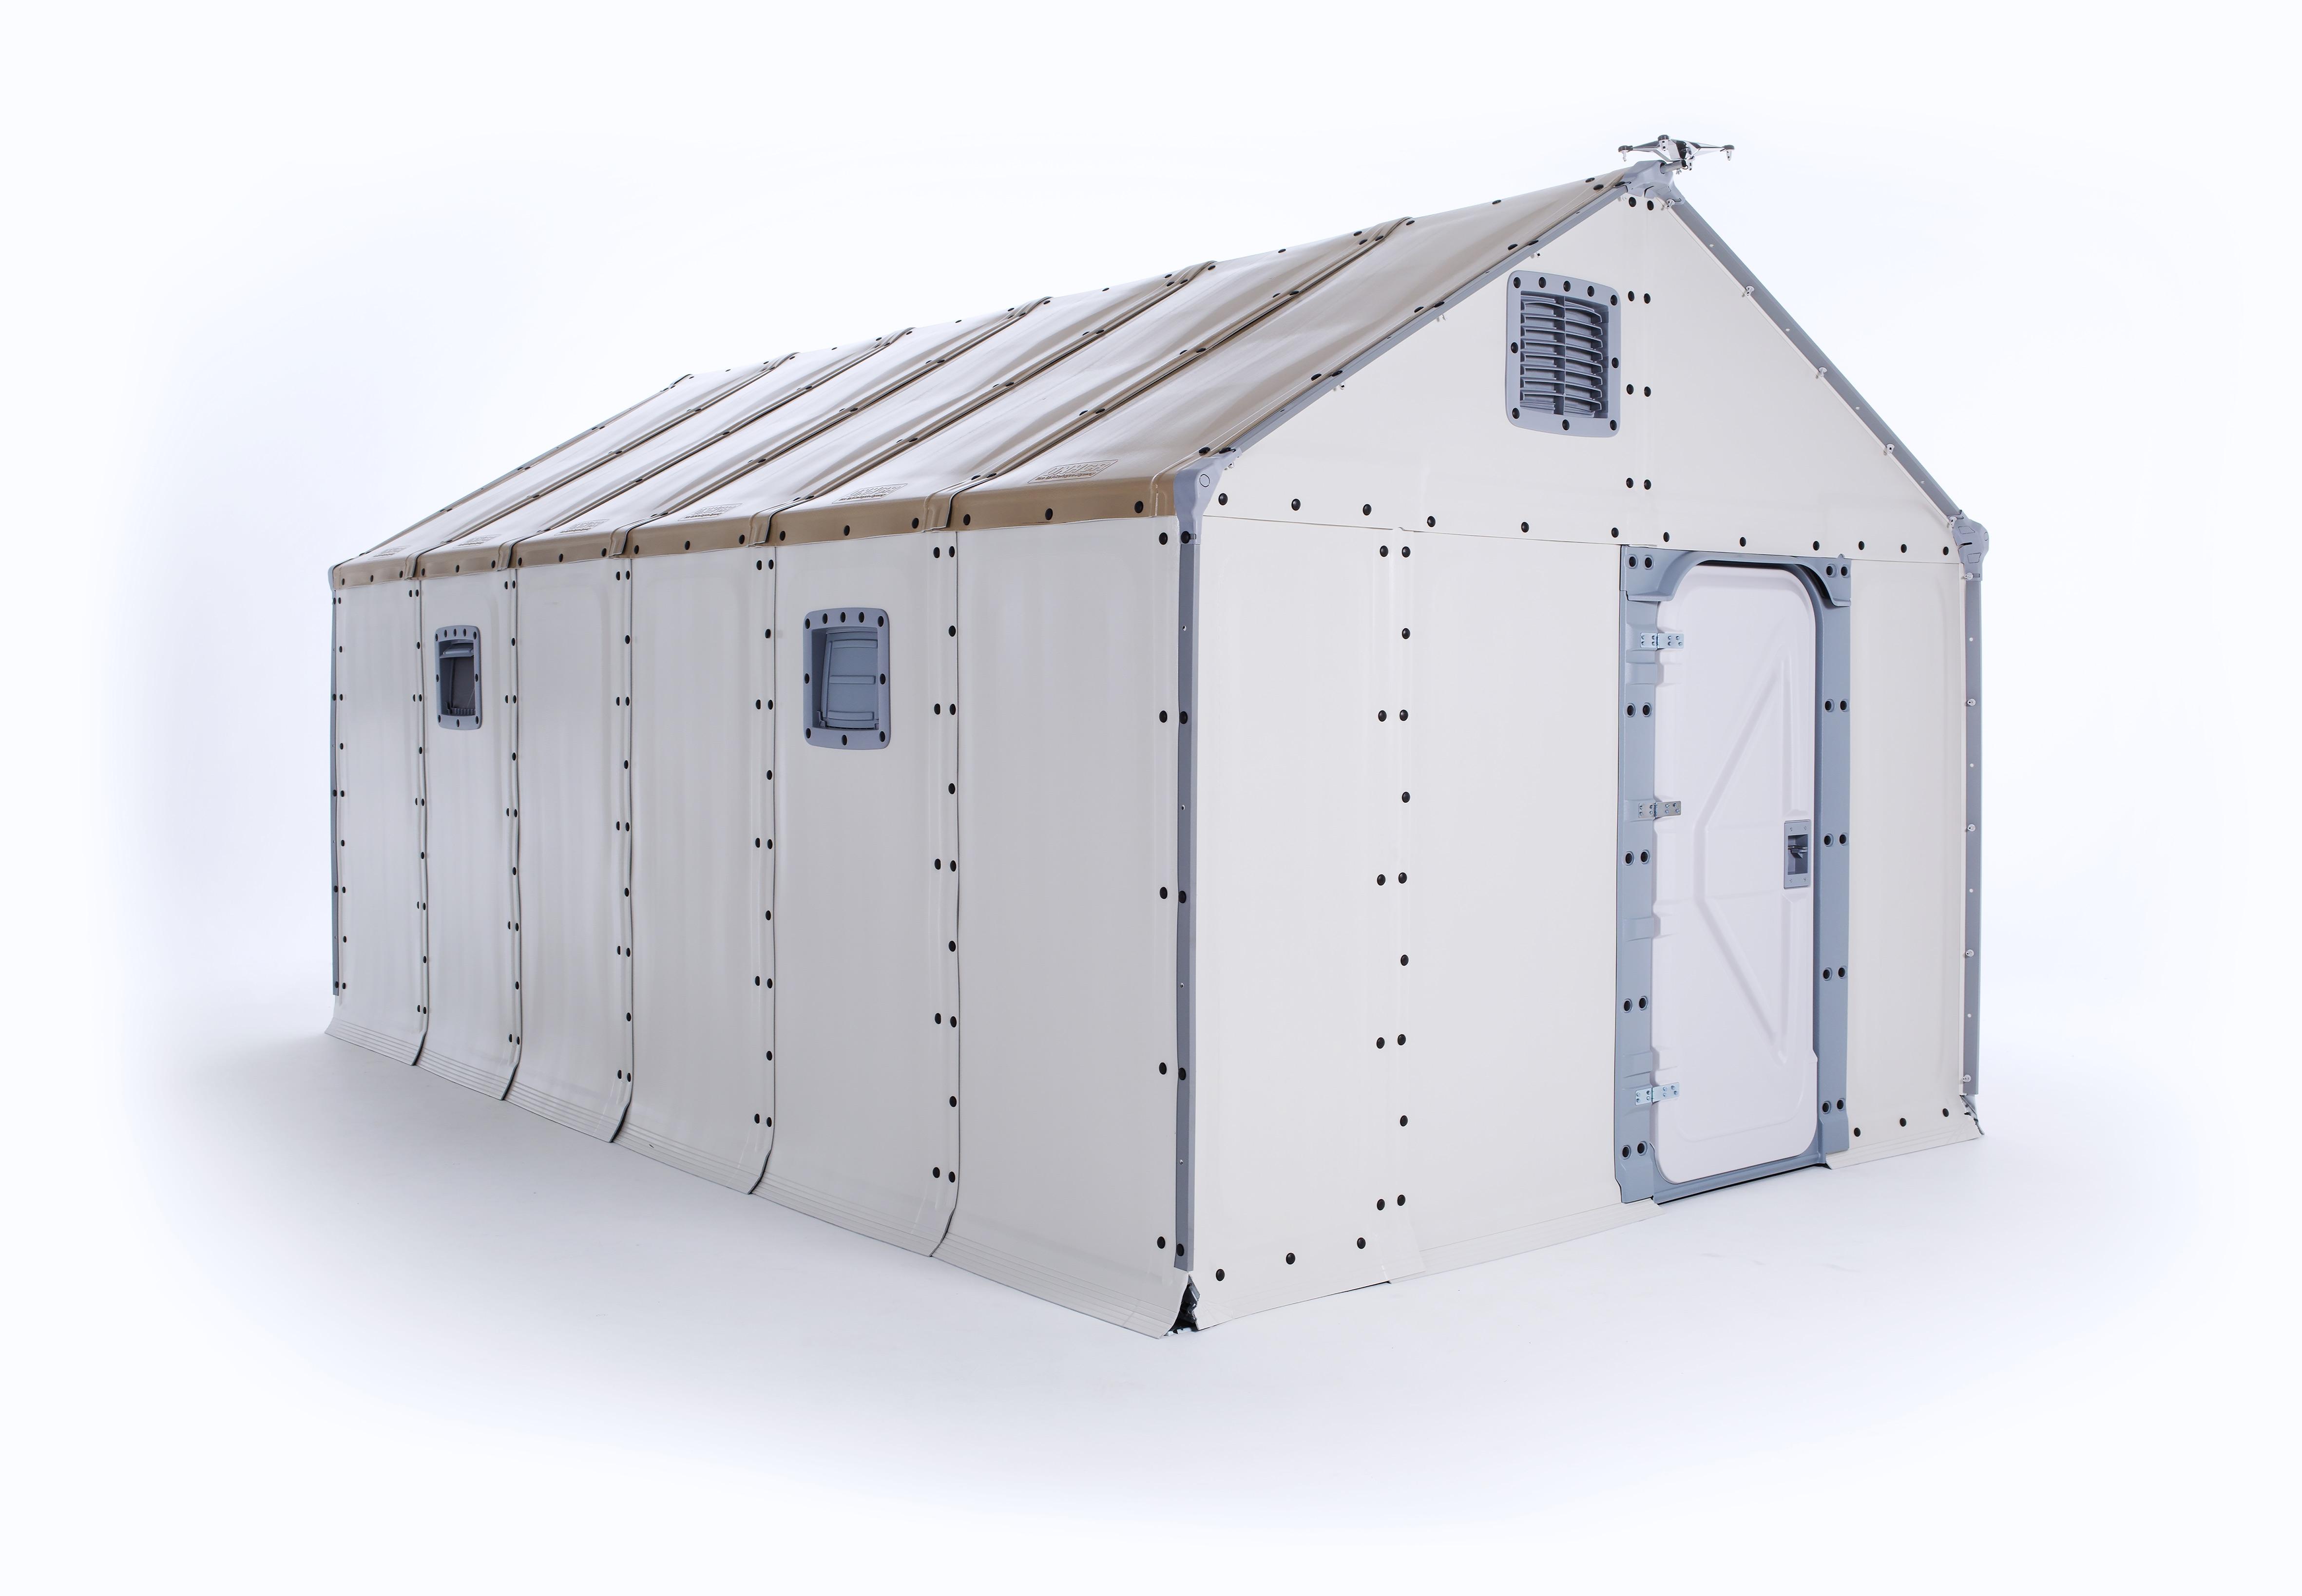 Ikea's Better Shelter wins best design of 2016 award